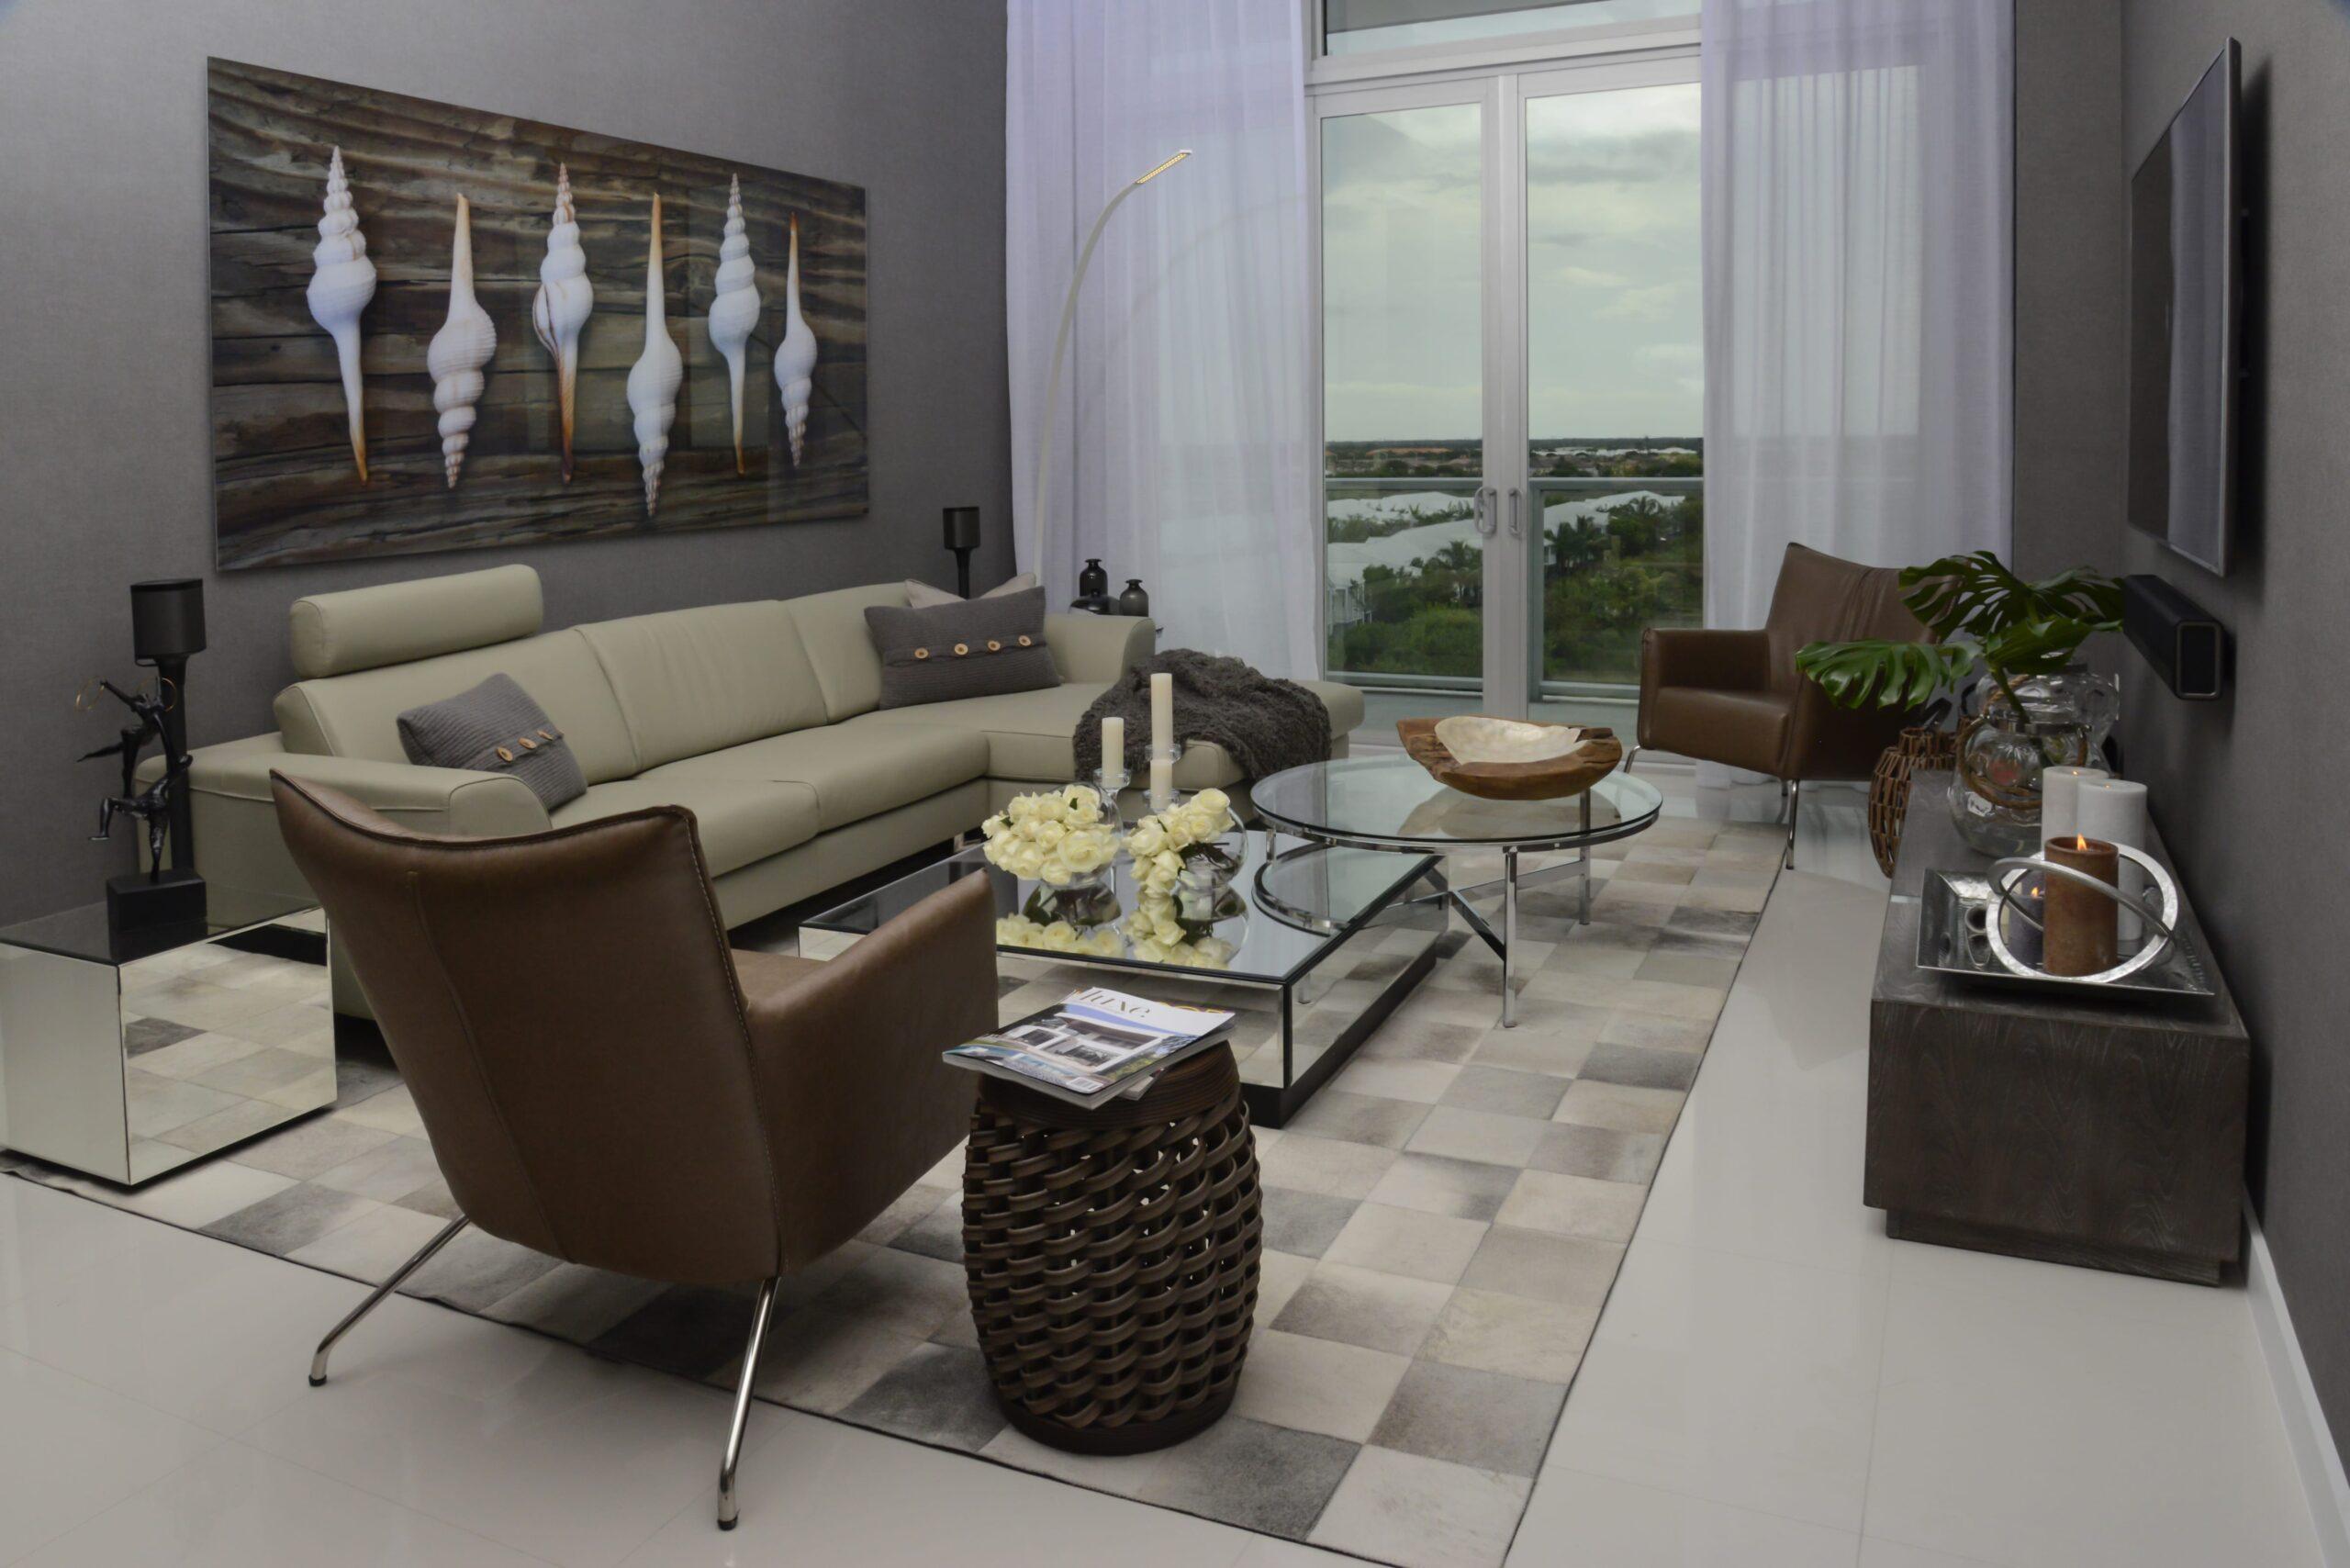 living area interior design by kstudio